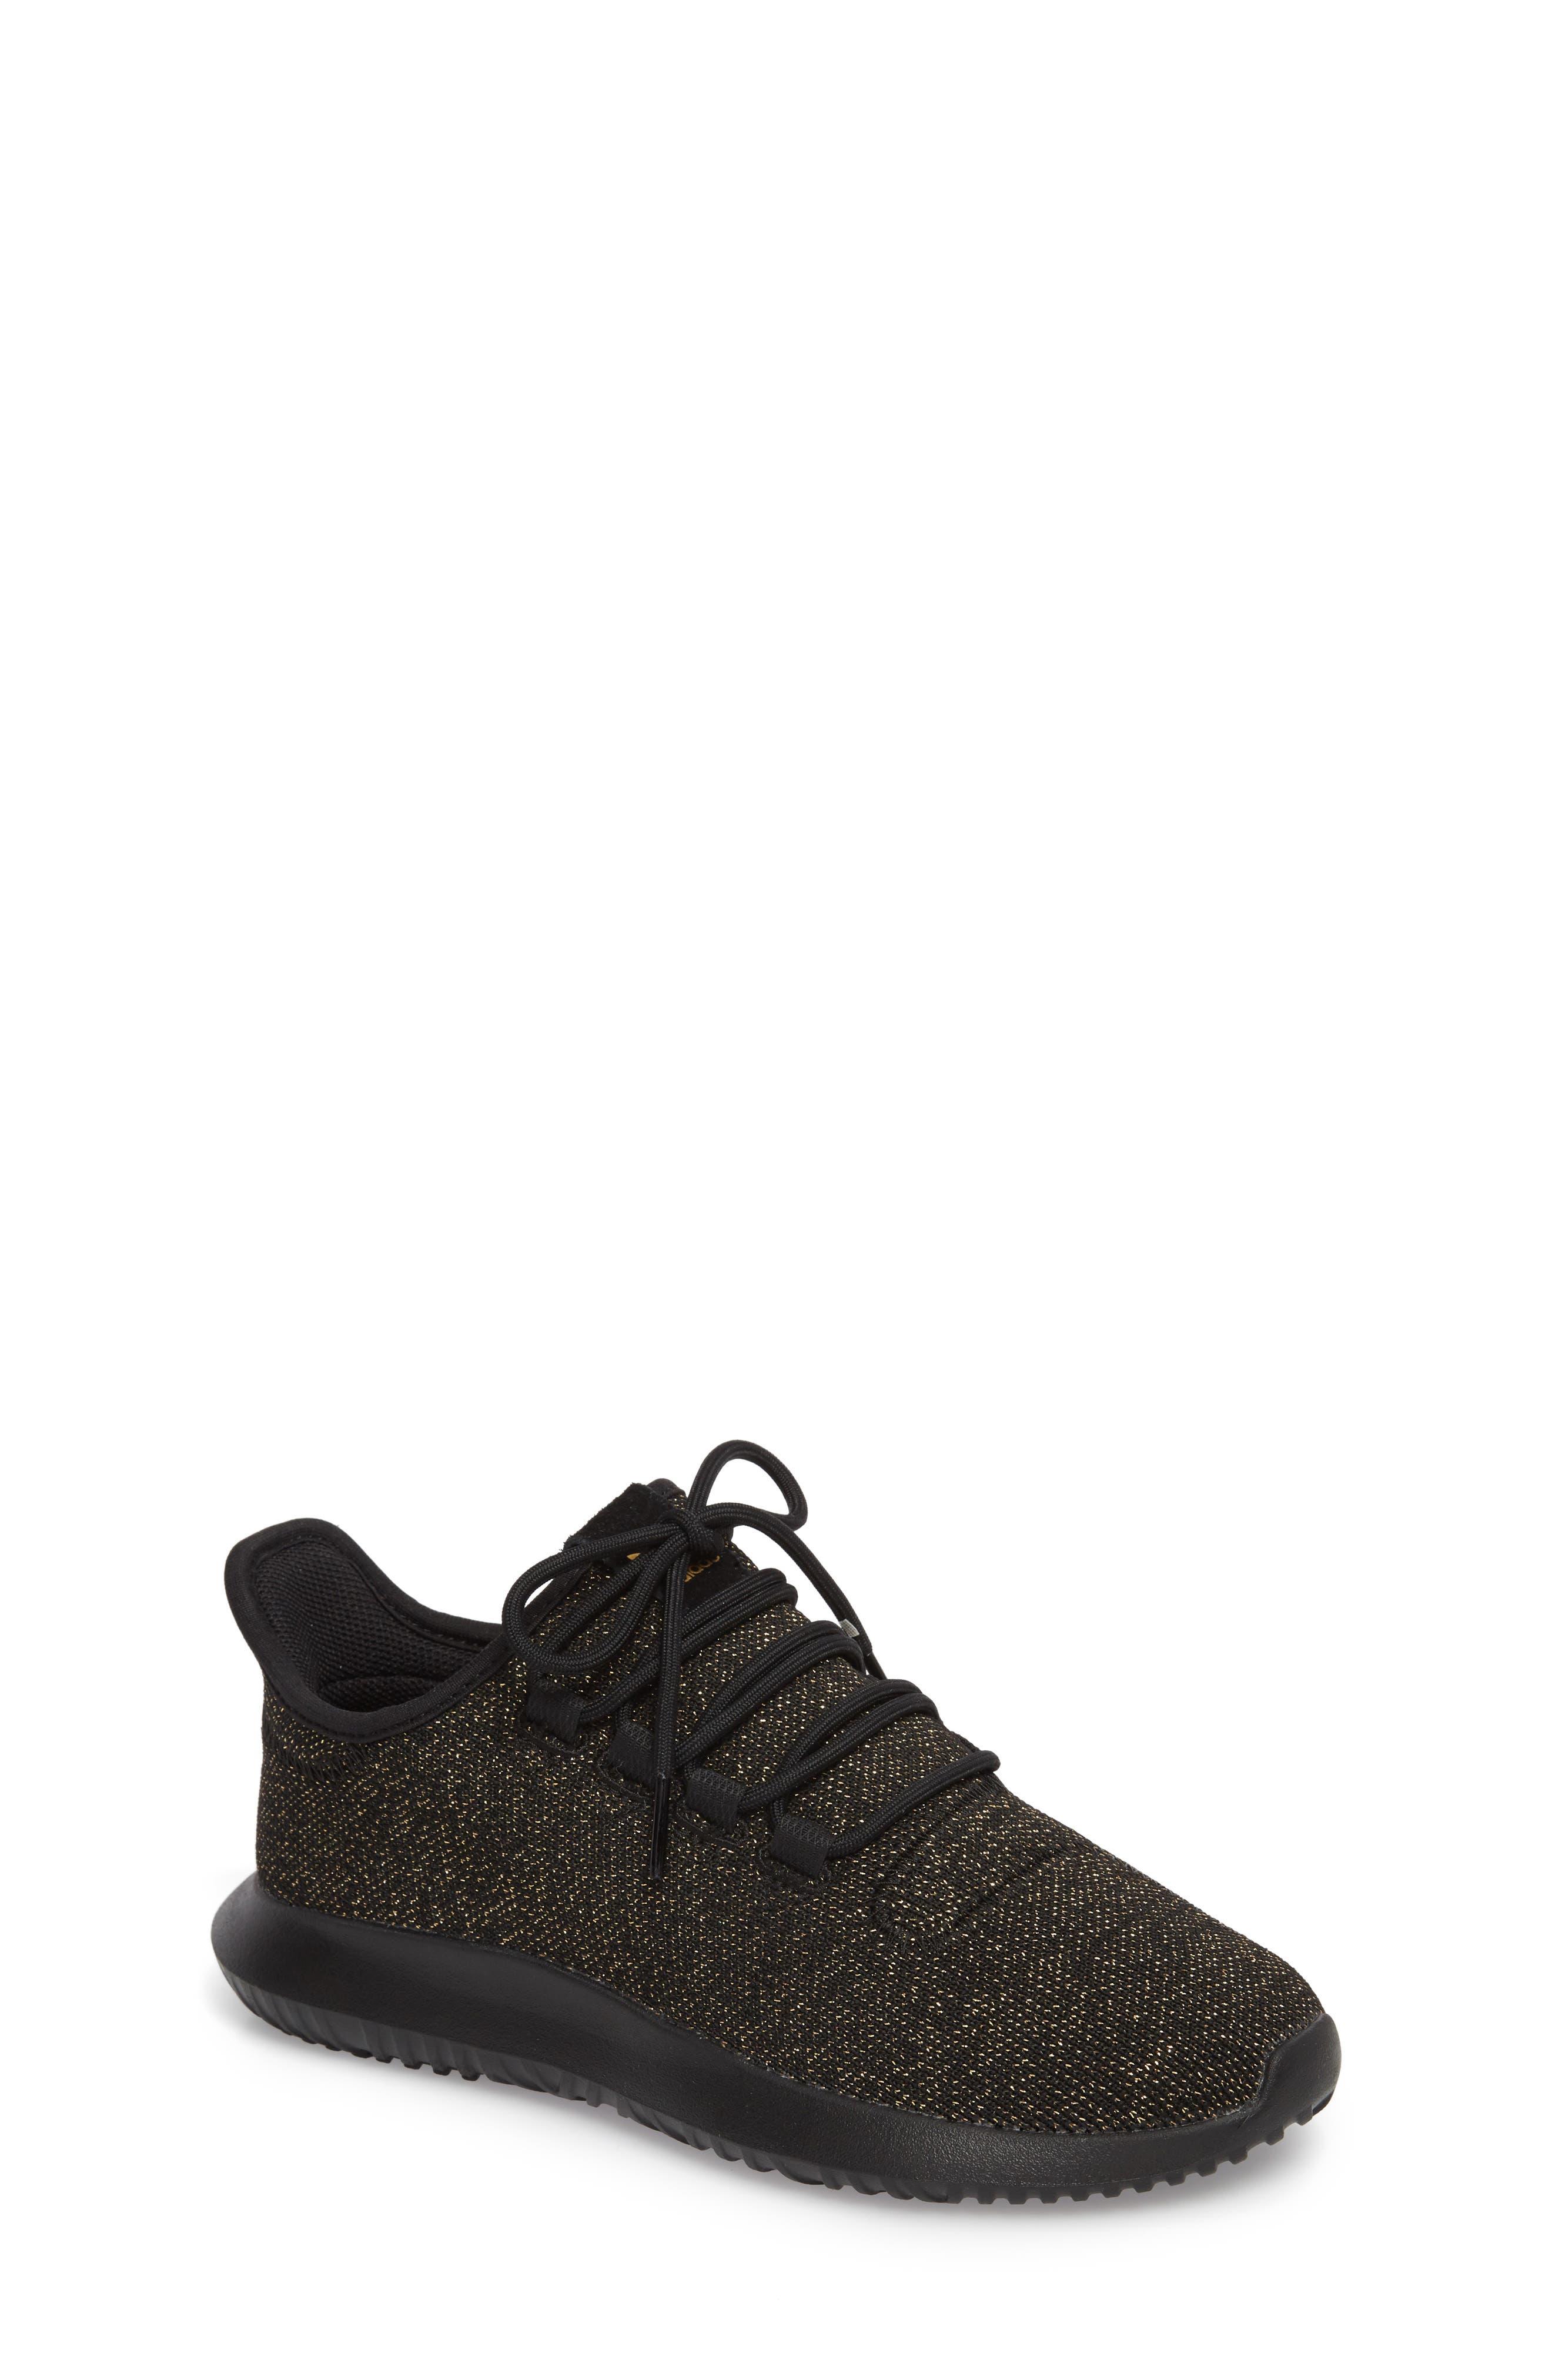 Tubular Shadow Sneaker,                             Main thumbnail 1, color,                             Core Black